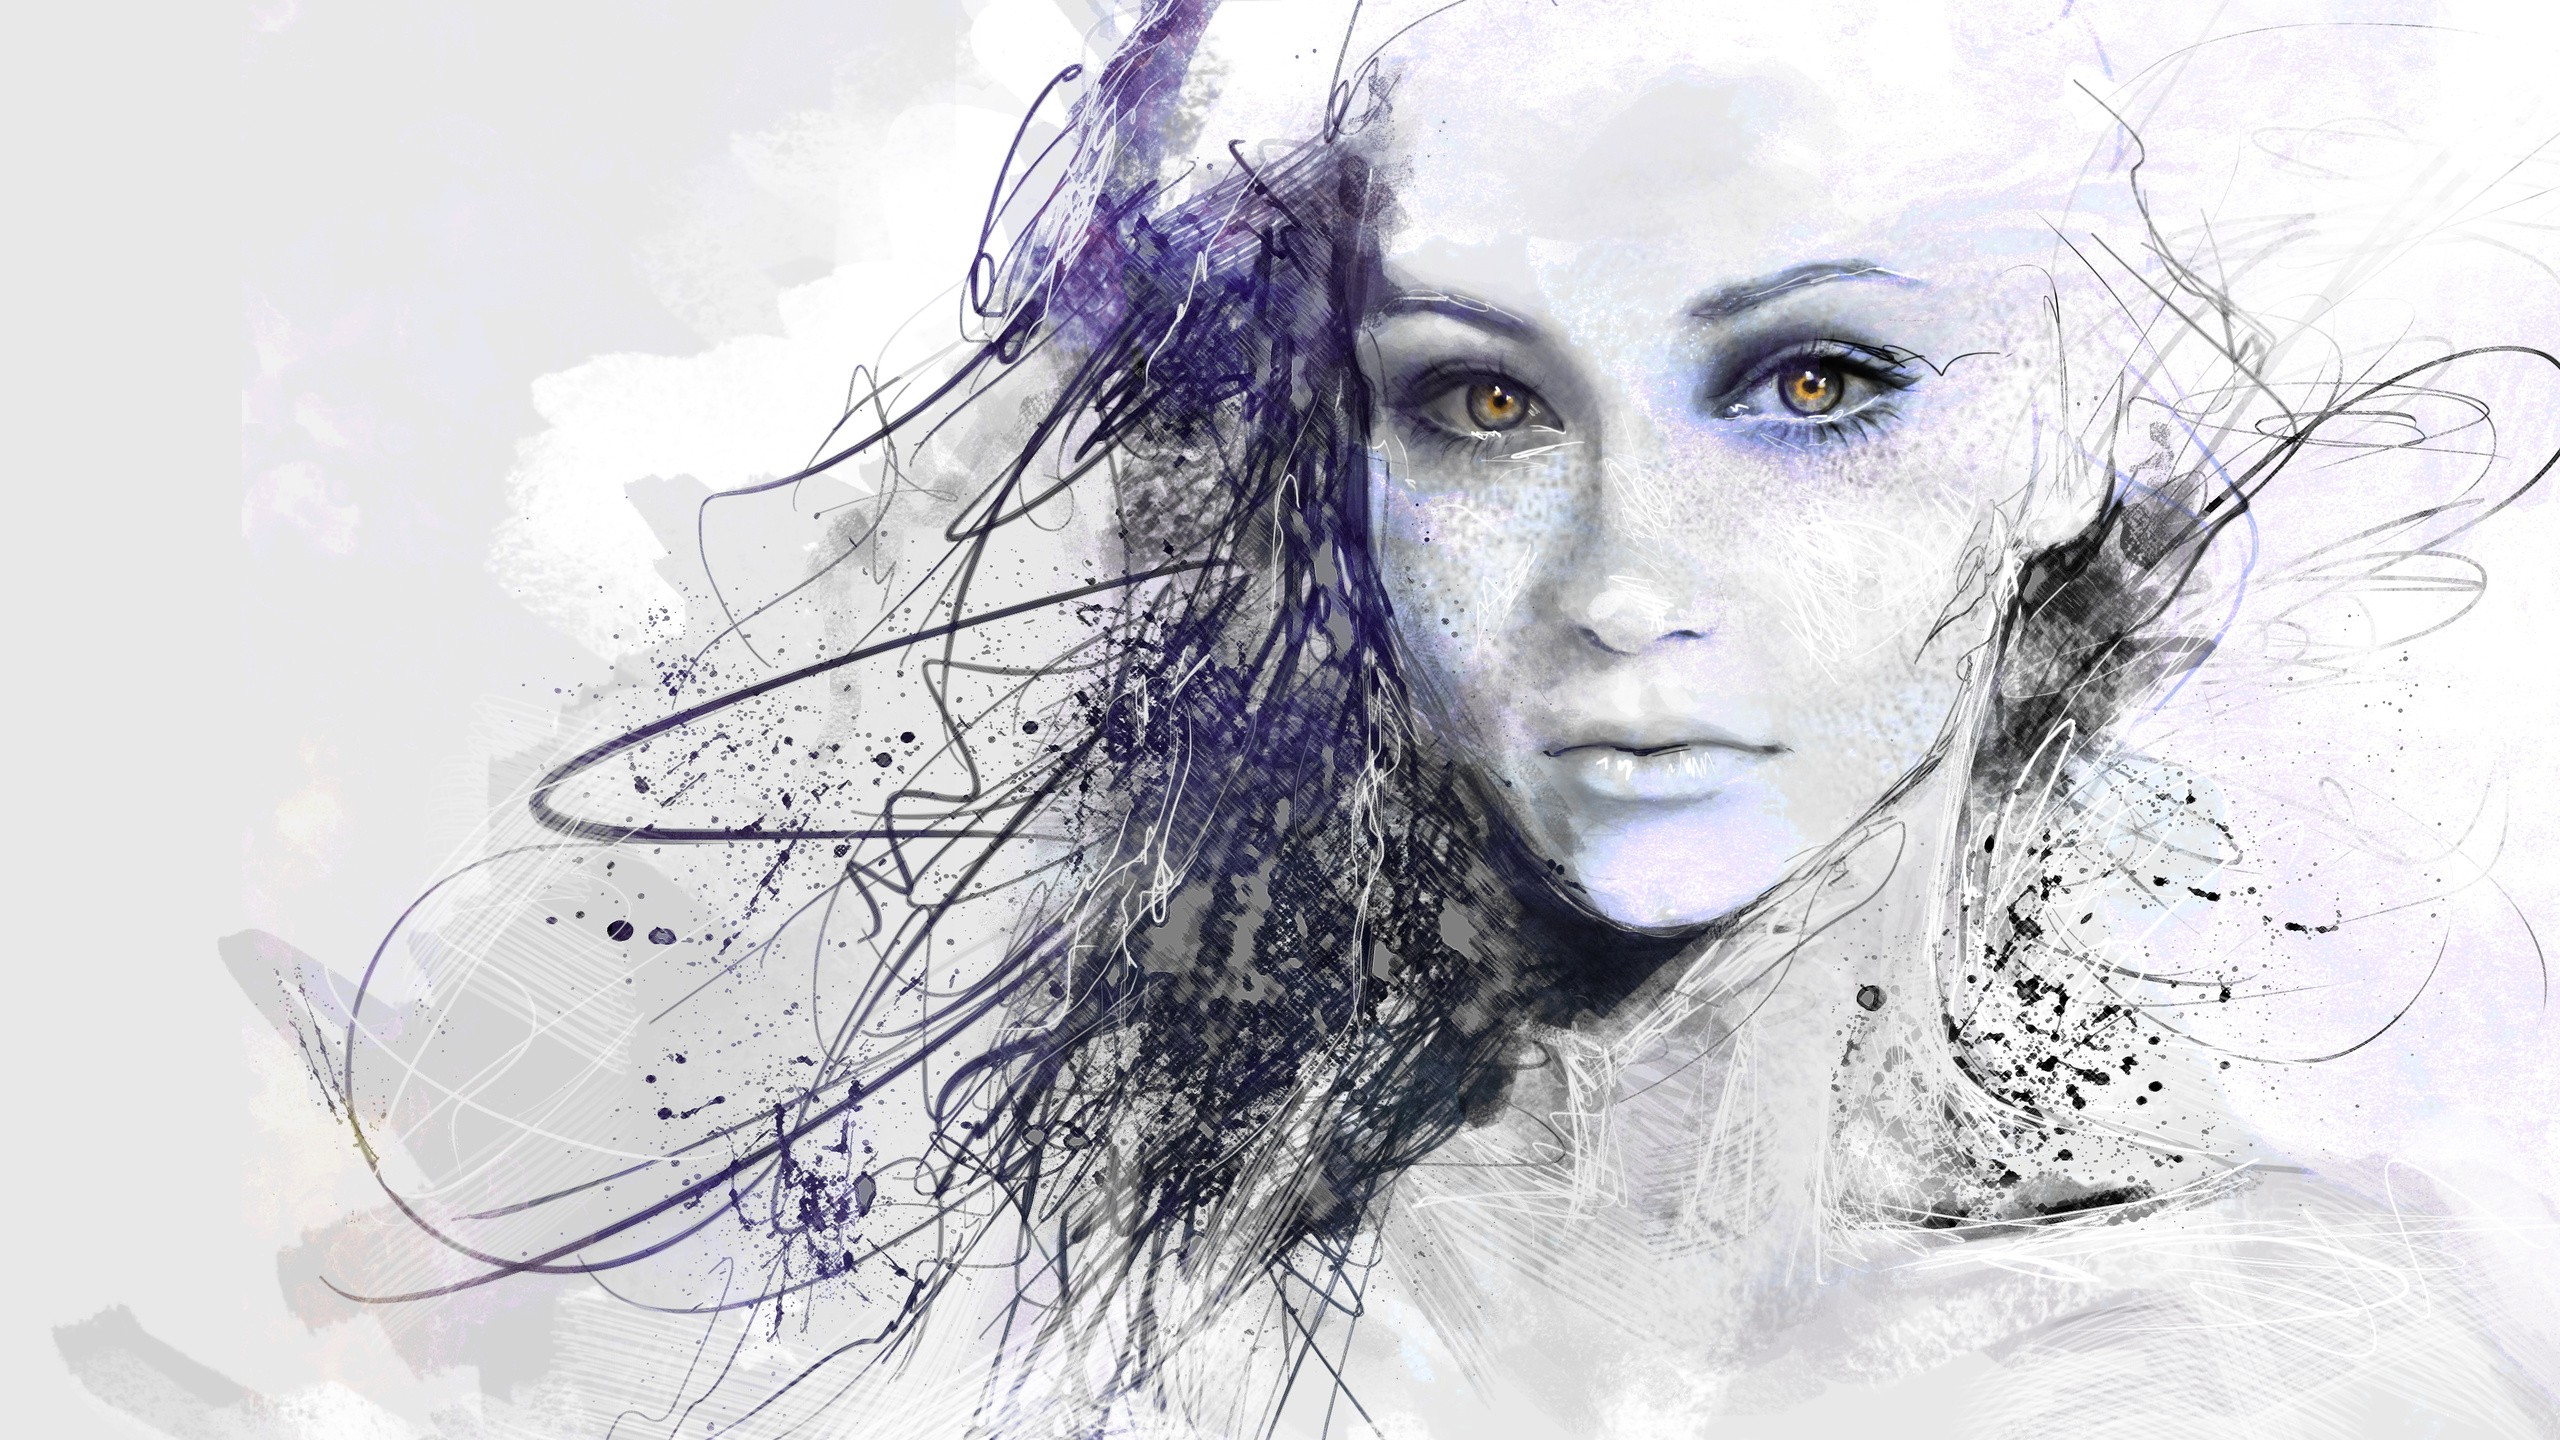 2560x1440 Wallpaper Face, Drawing, White, Digital Art, Women, Portrait